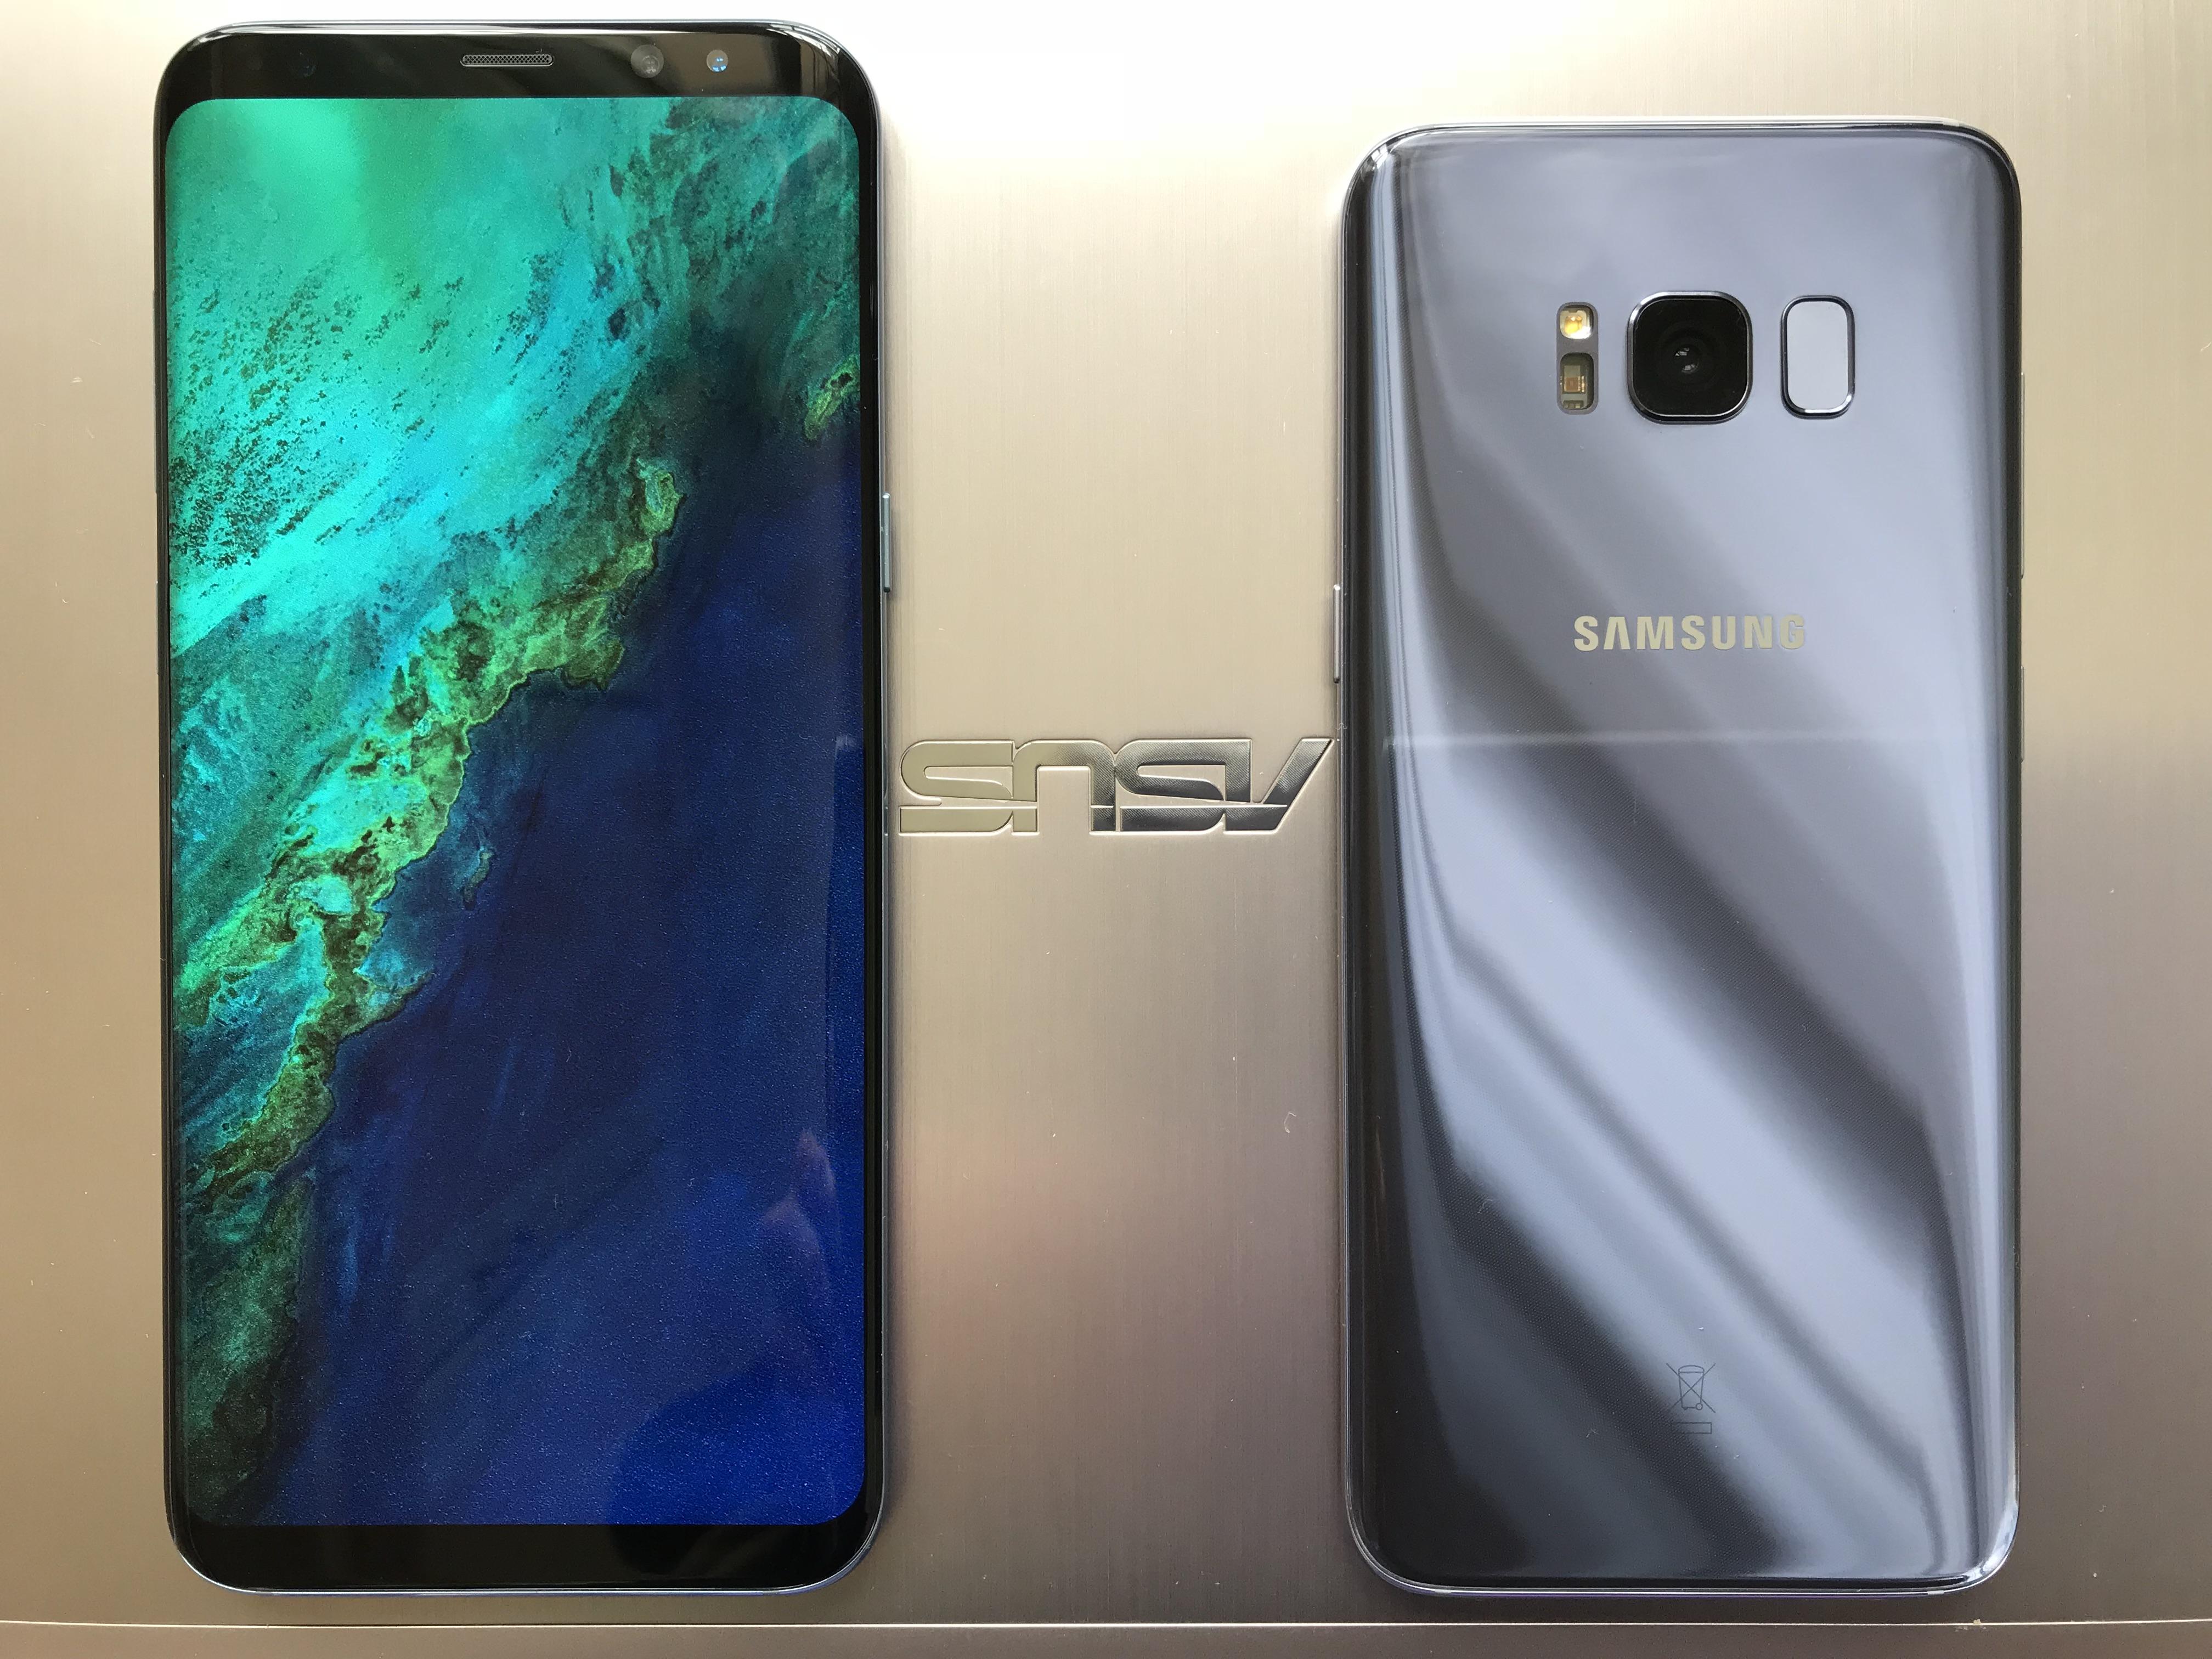 Samsung E330 - full specs, photos and more | 3024x4032